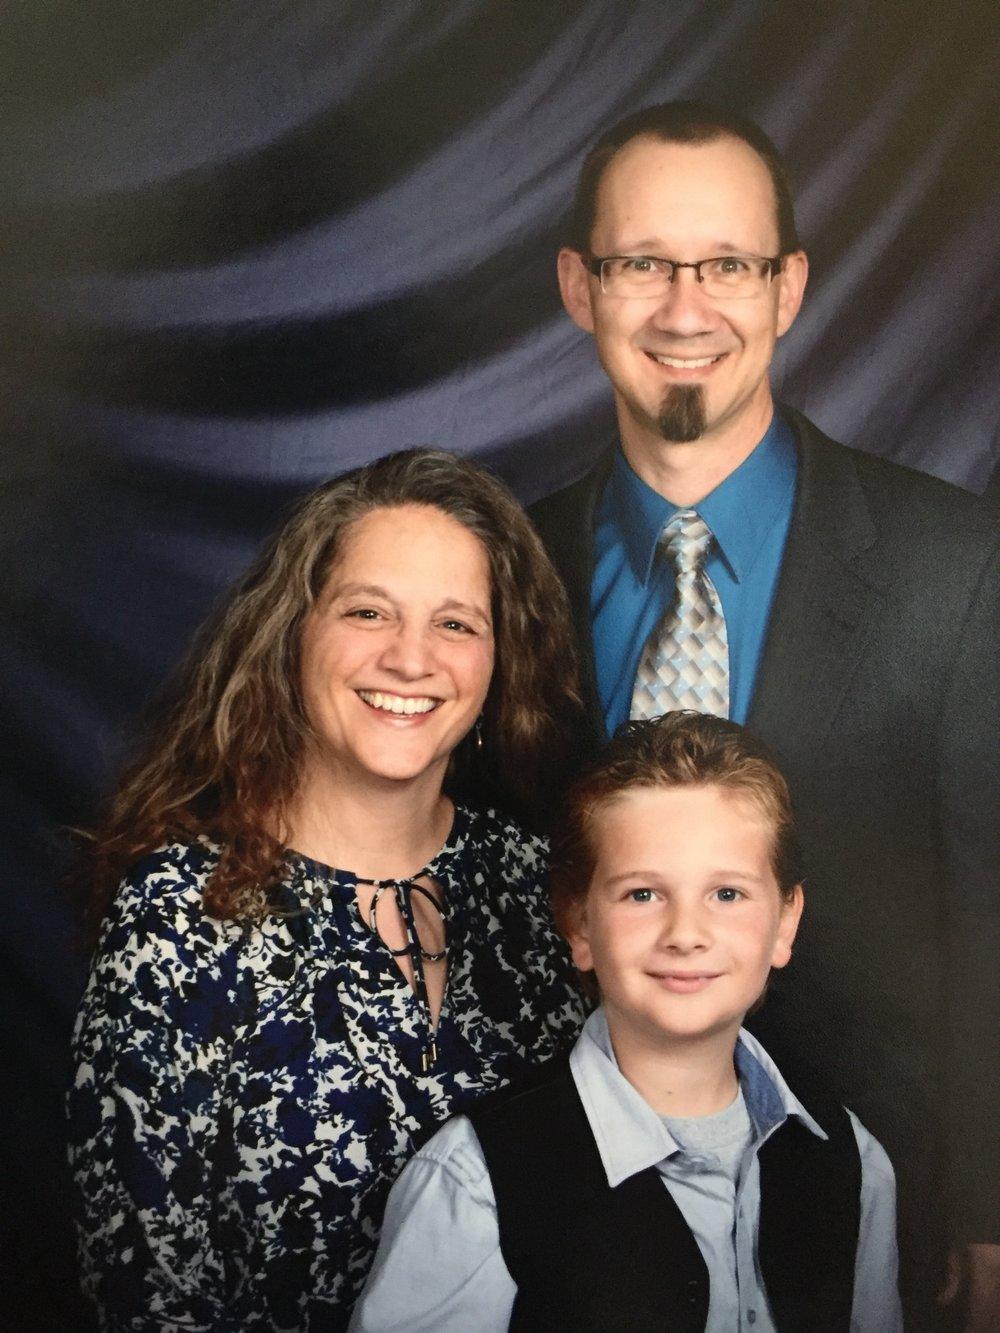 JOE, PAM & eLIJAH JACOBSON